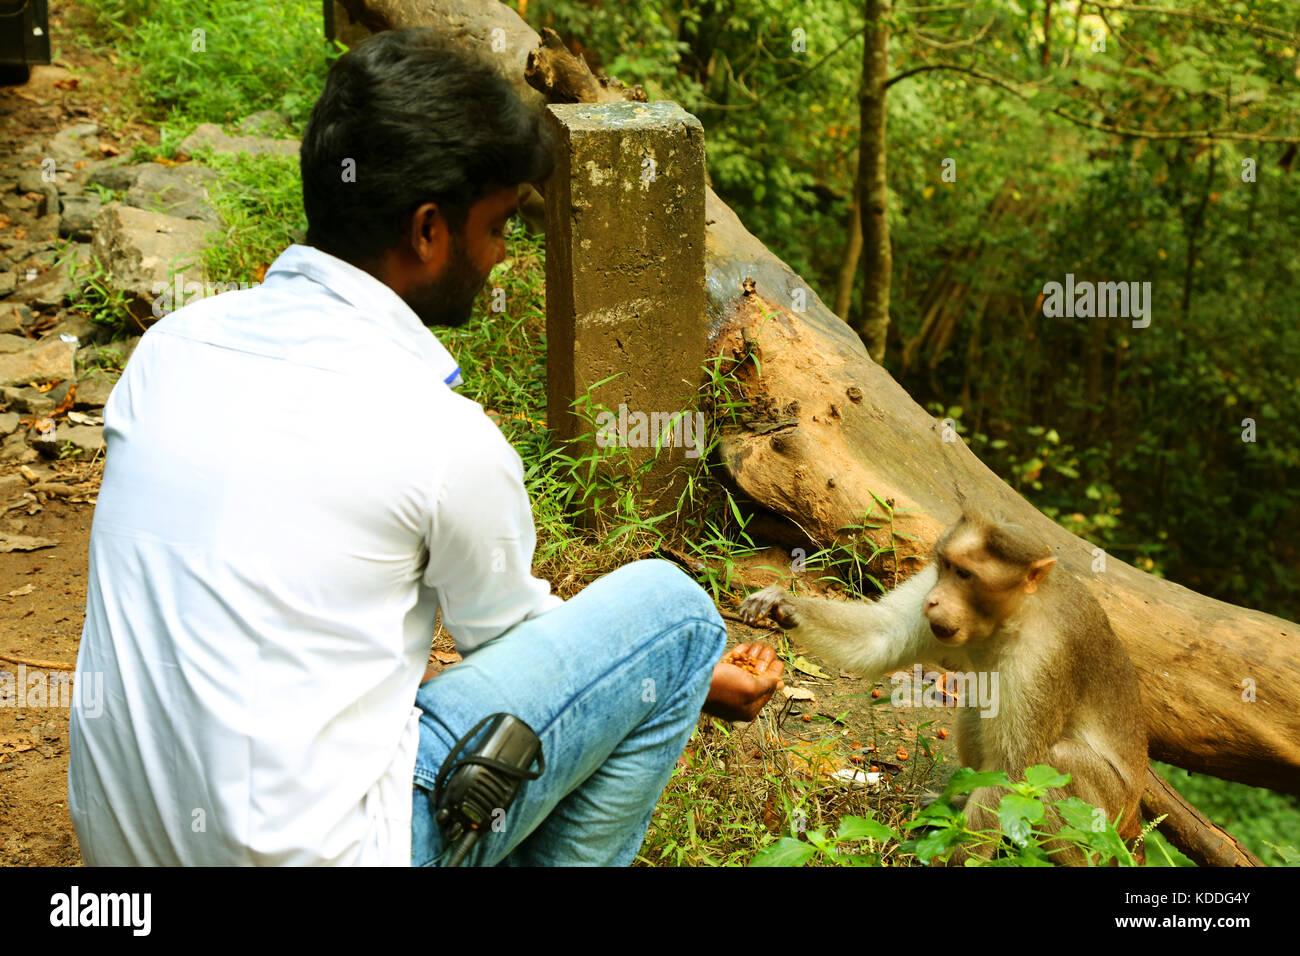 Young man feeding a monkey Stock Photo